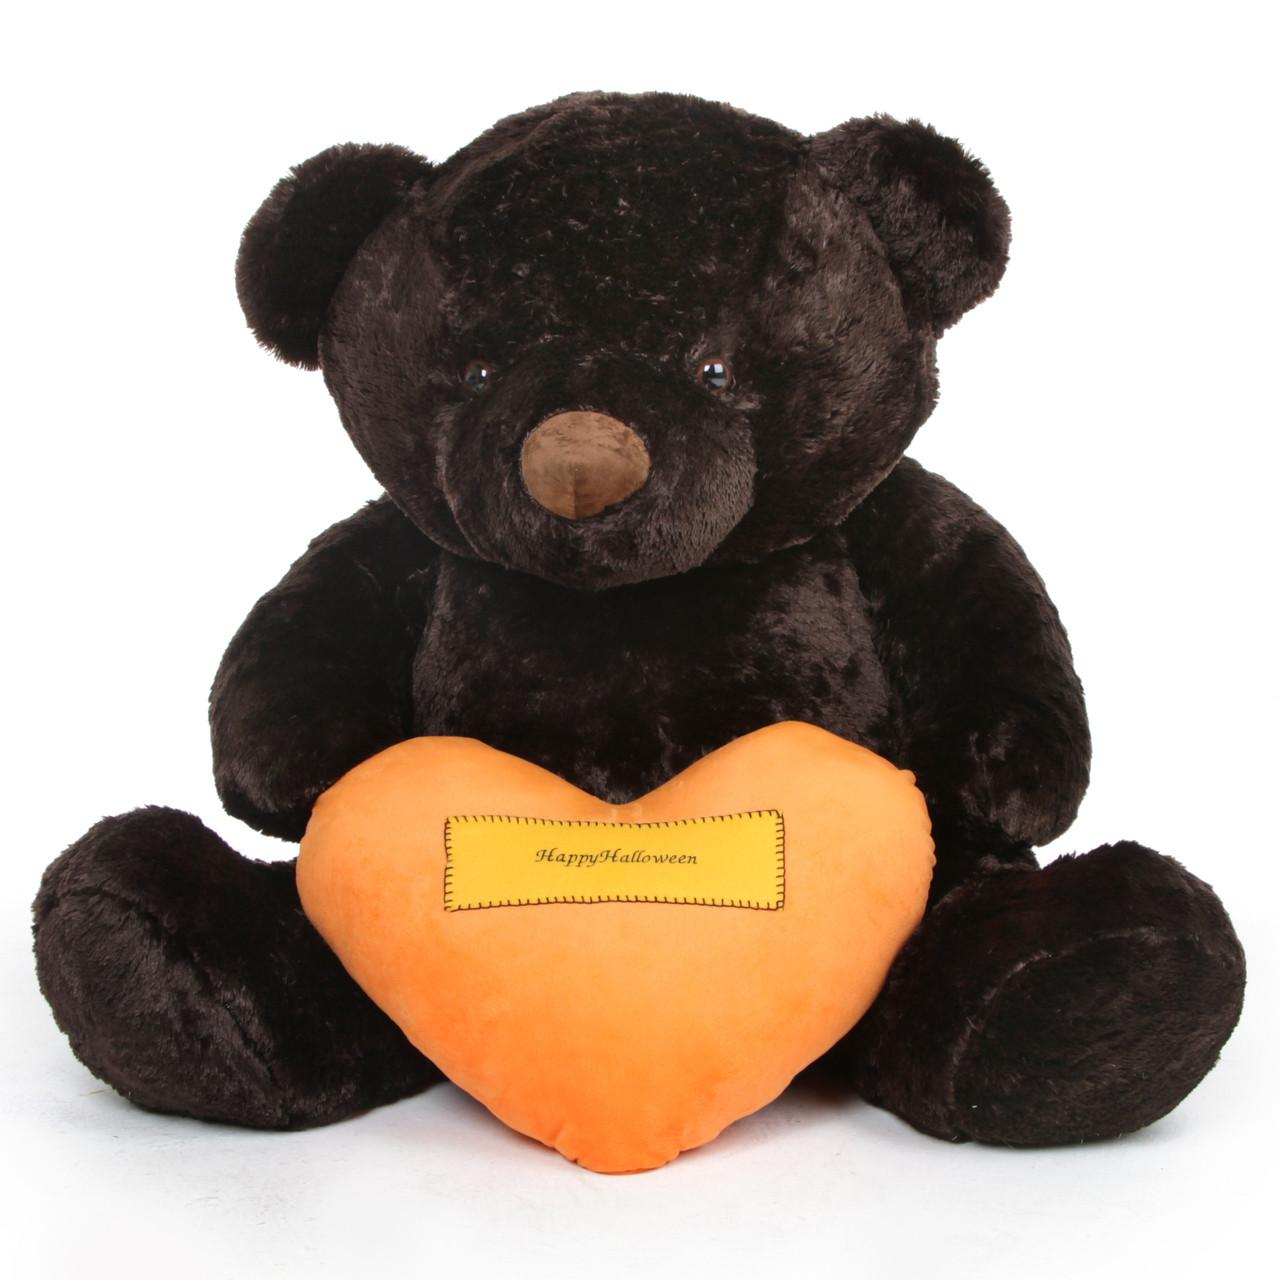 Gay bear dating apps